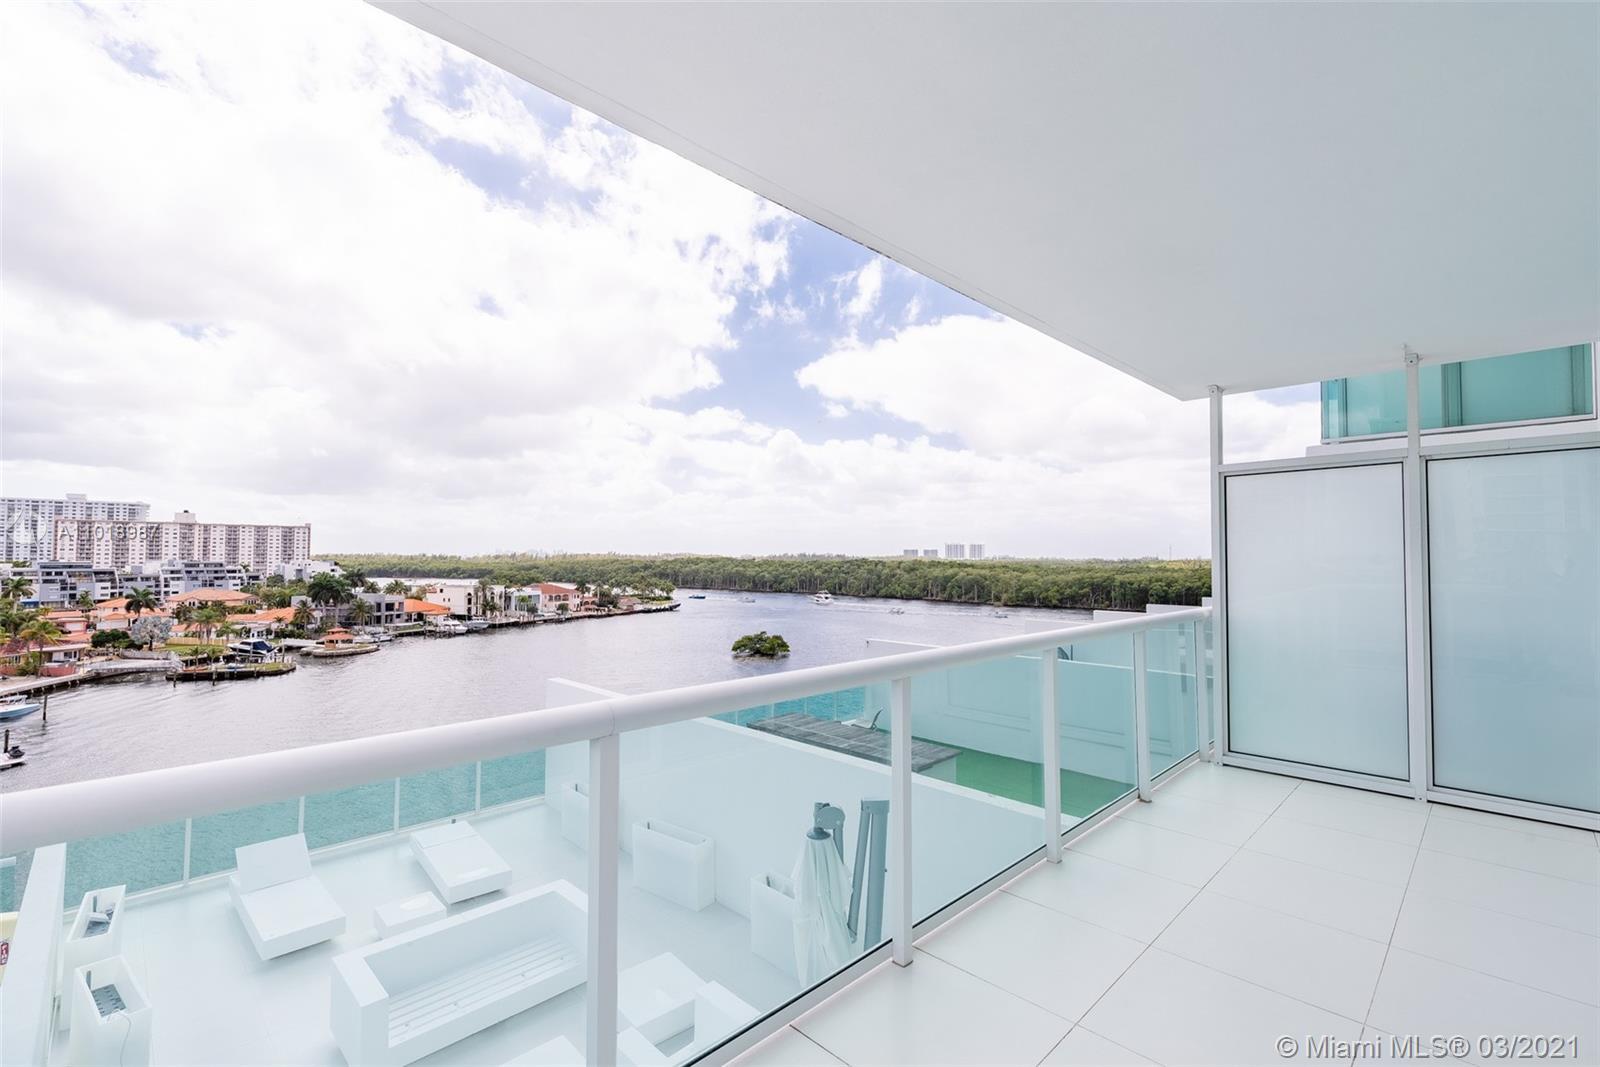 400 Sunny Isles #722 - 400 Sunny Isles Blvd #722, Sunny Isles Beach, FL 33160